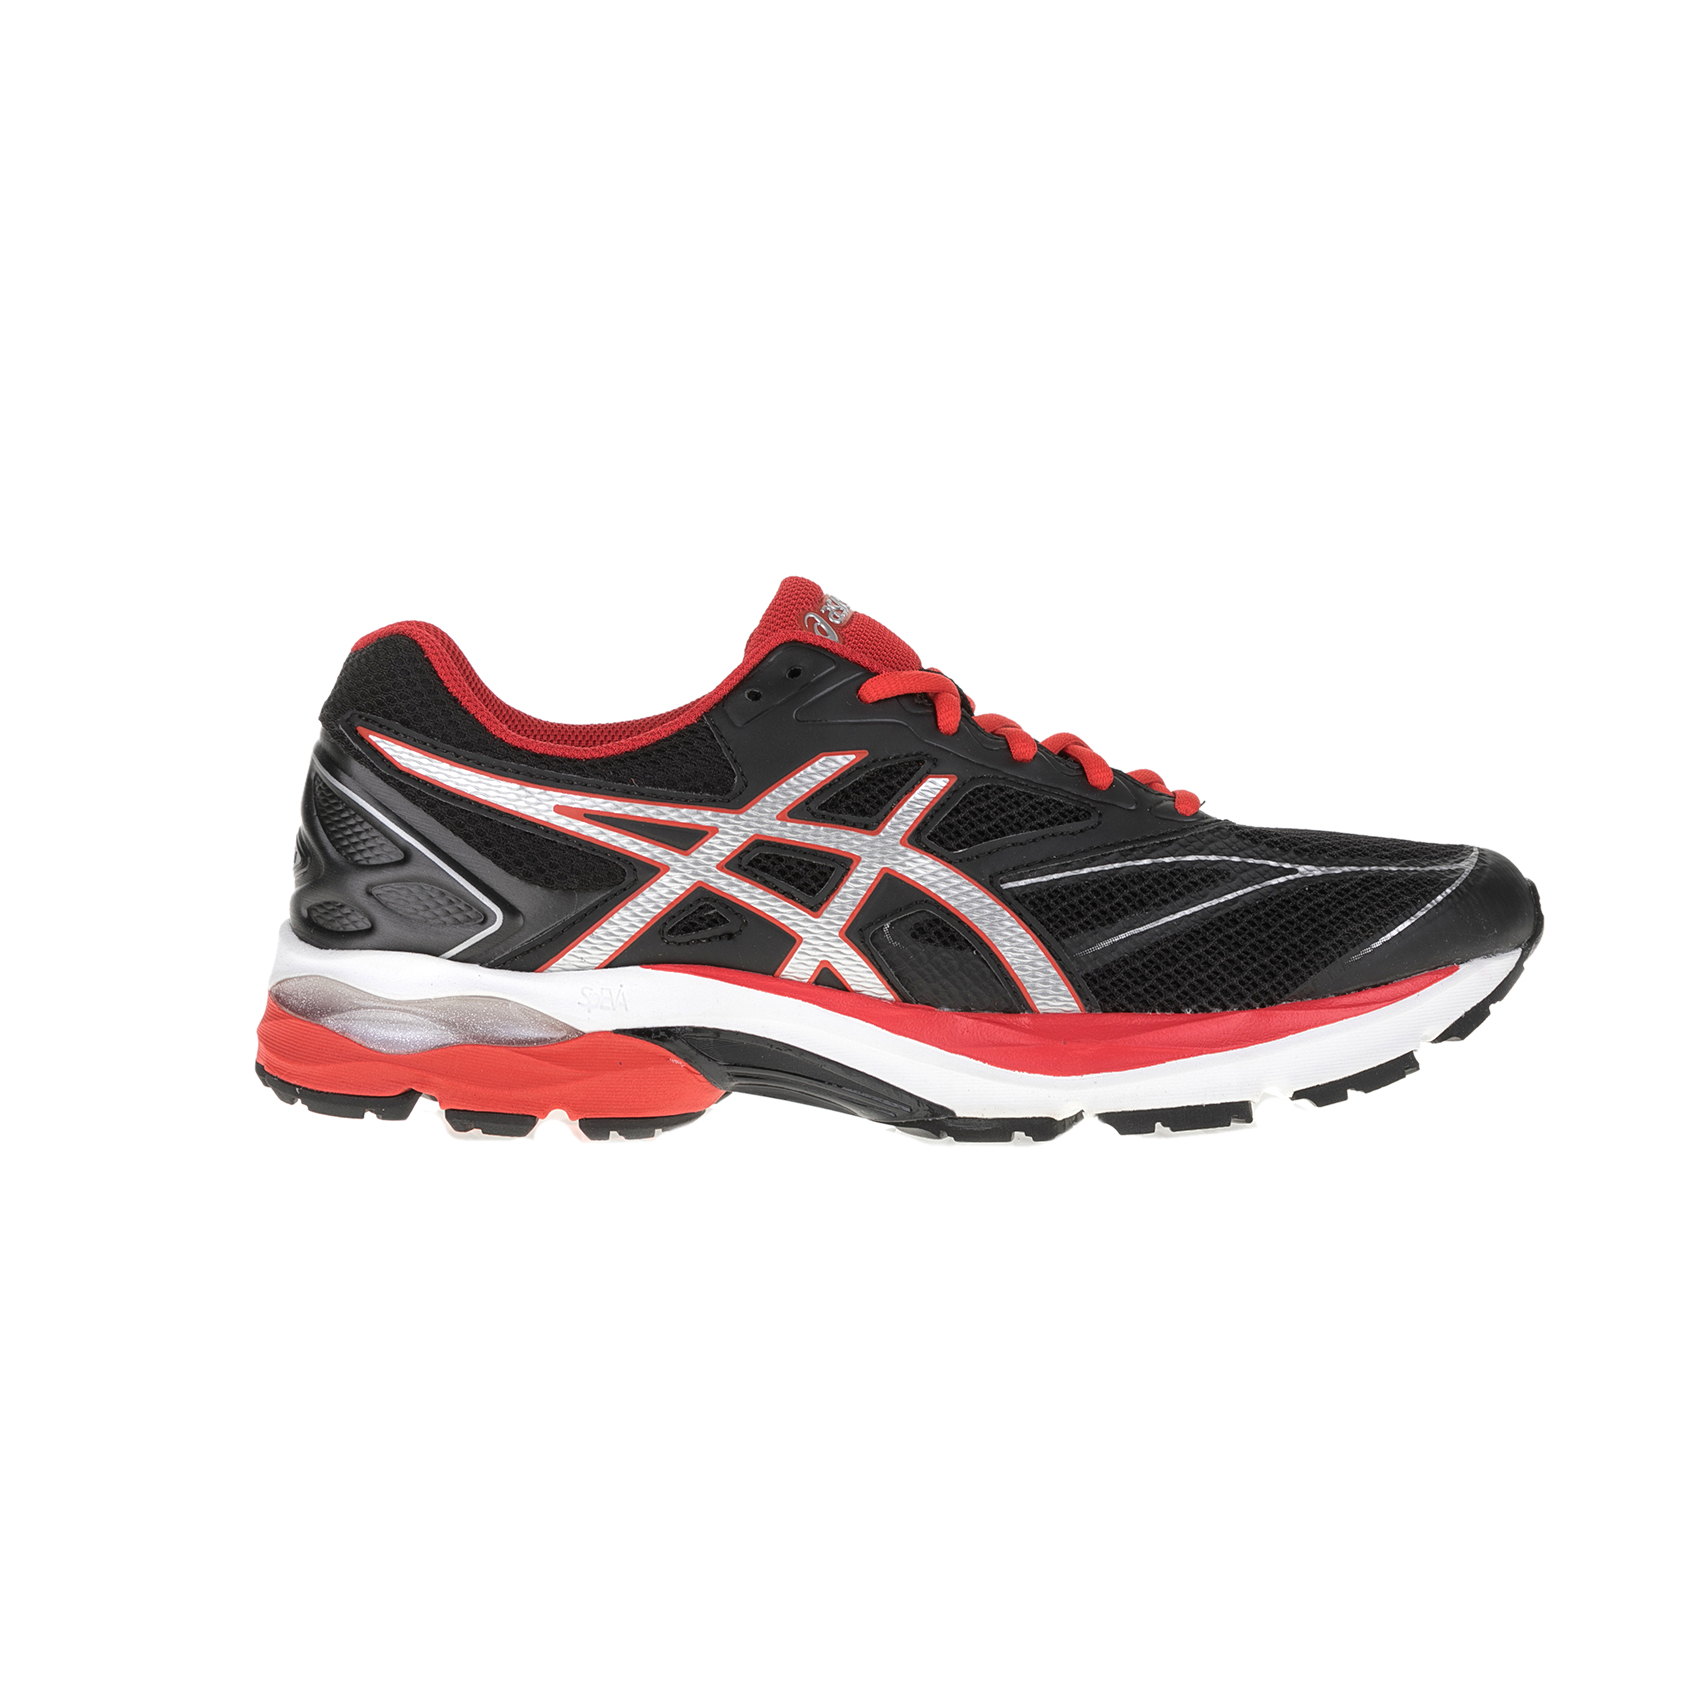 ASICS - Ανδρικά παπούτσια ASICS GEL-PULSE 8 κόκκινα ανδρικά παπούτσια αθλητικά running